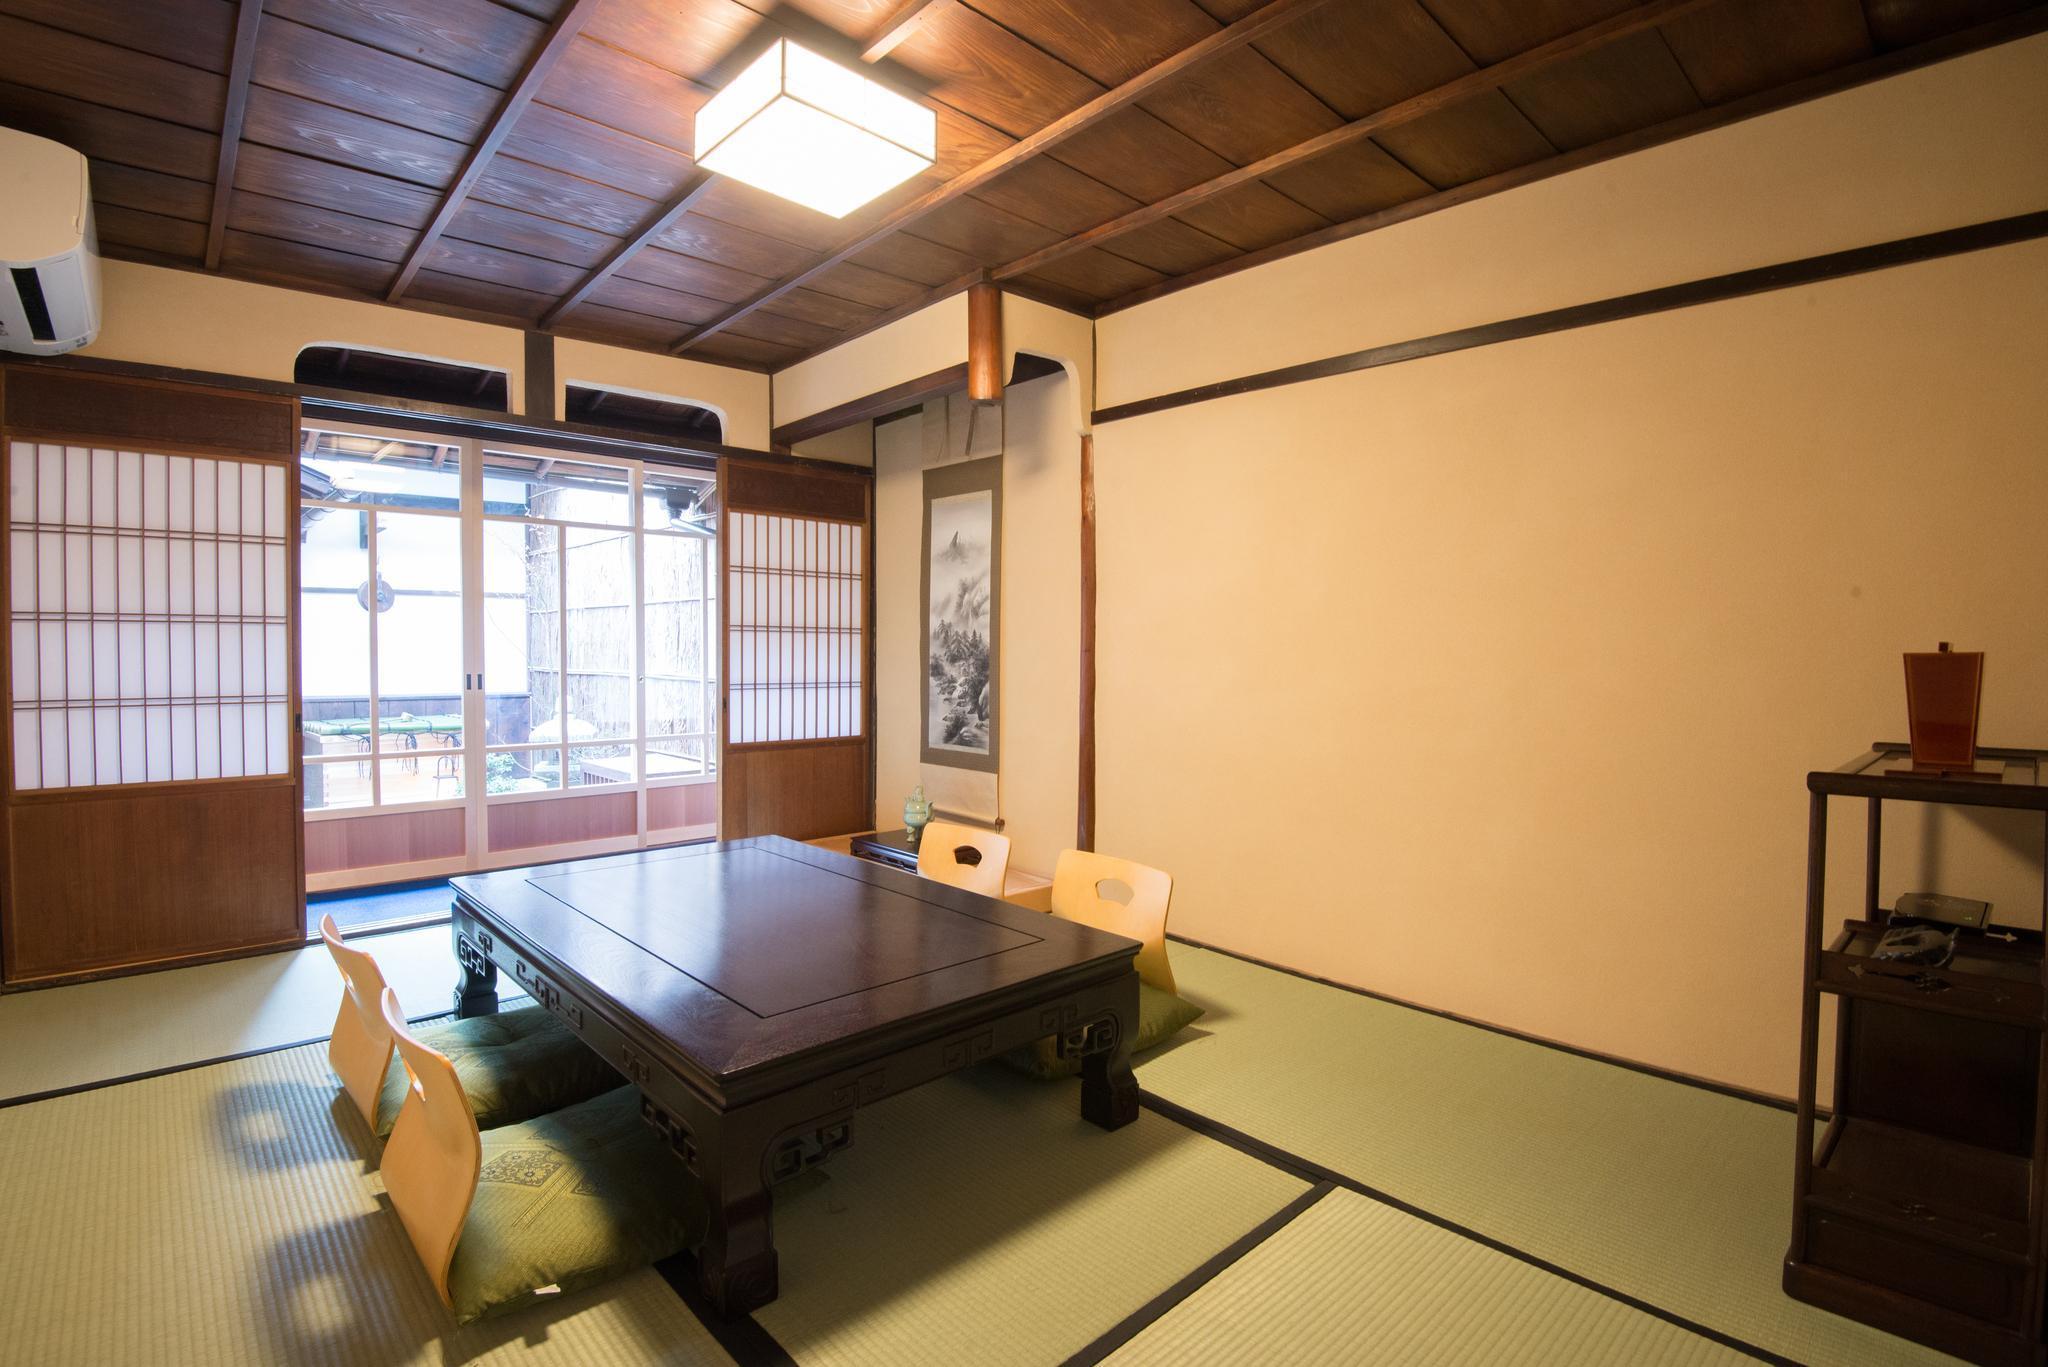 Nishijin Kyomachiya Byakko Tei